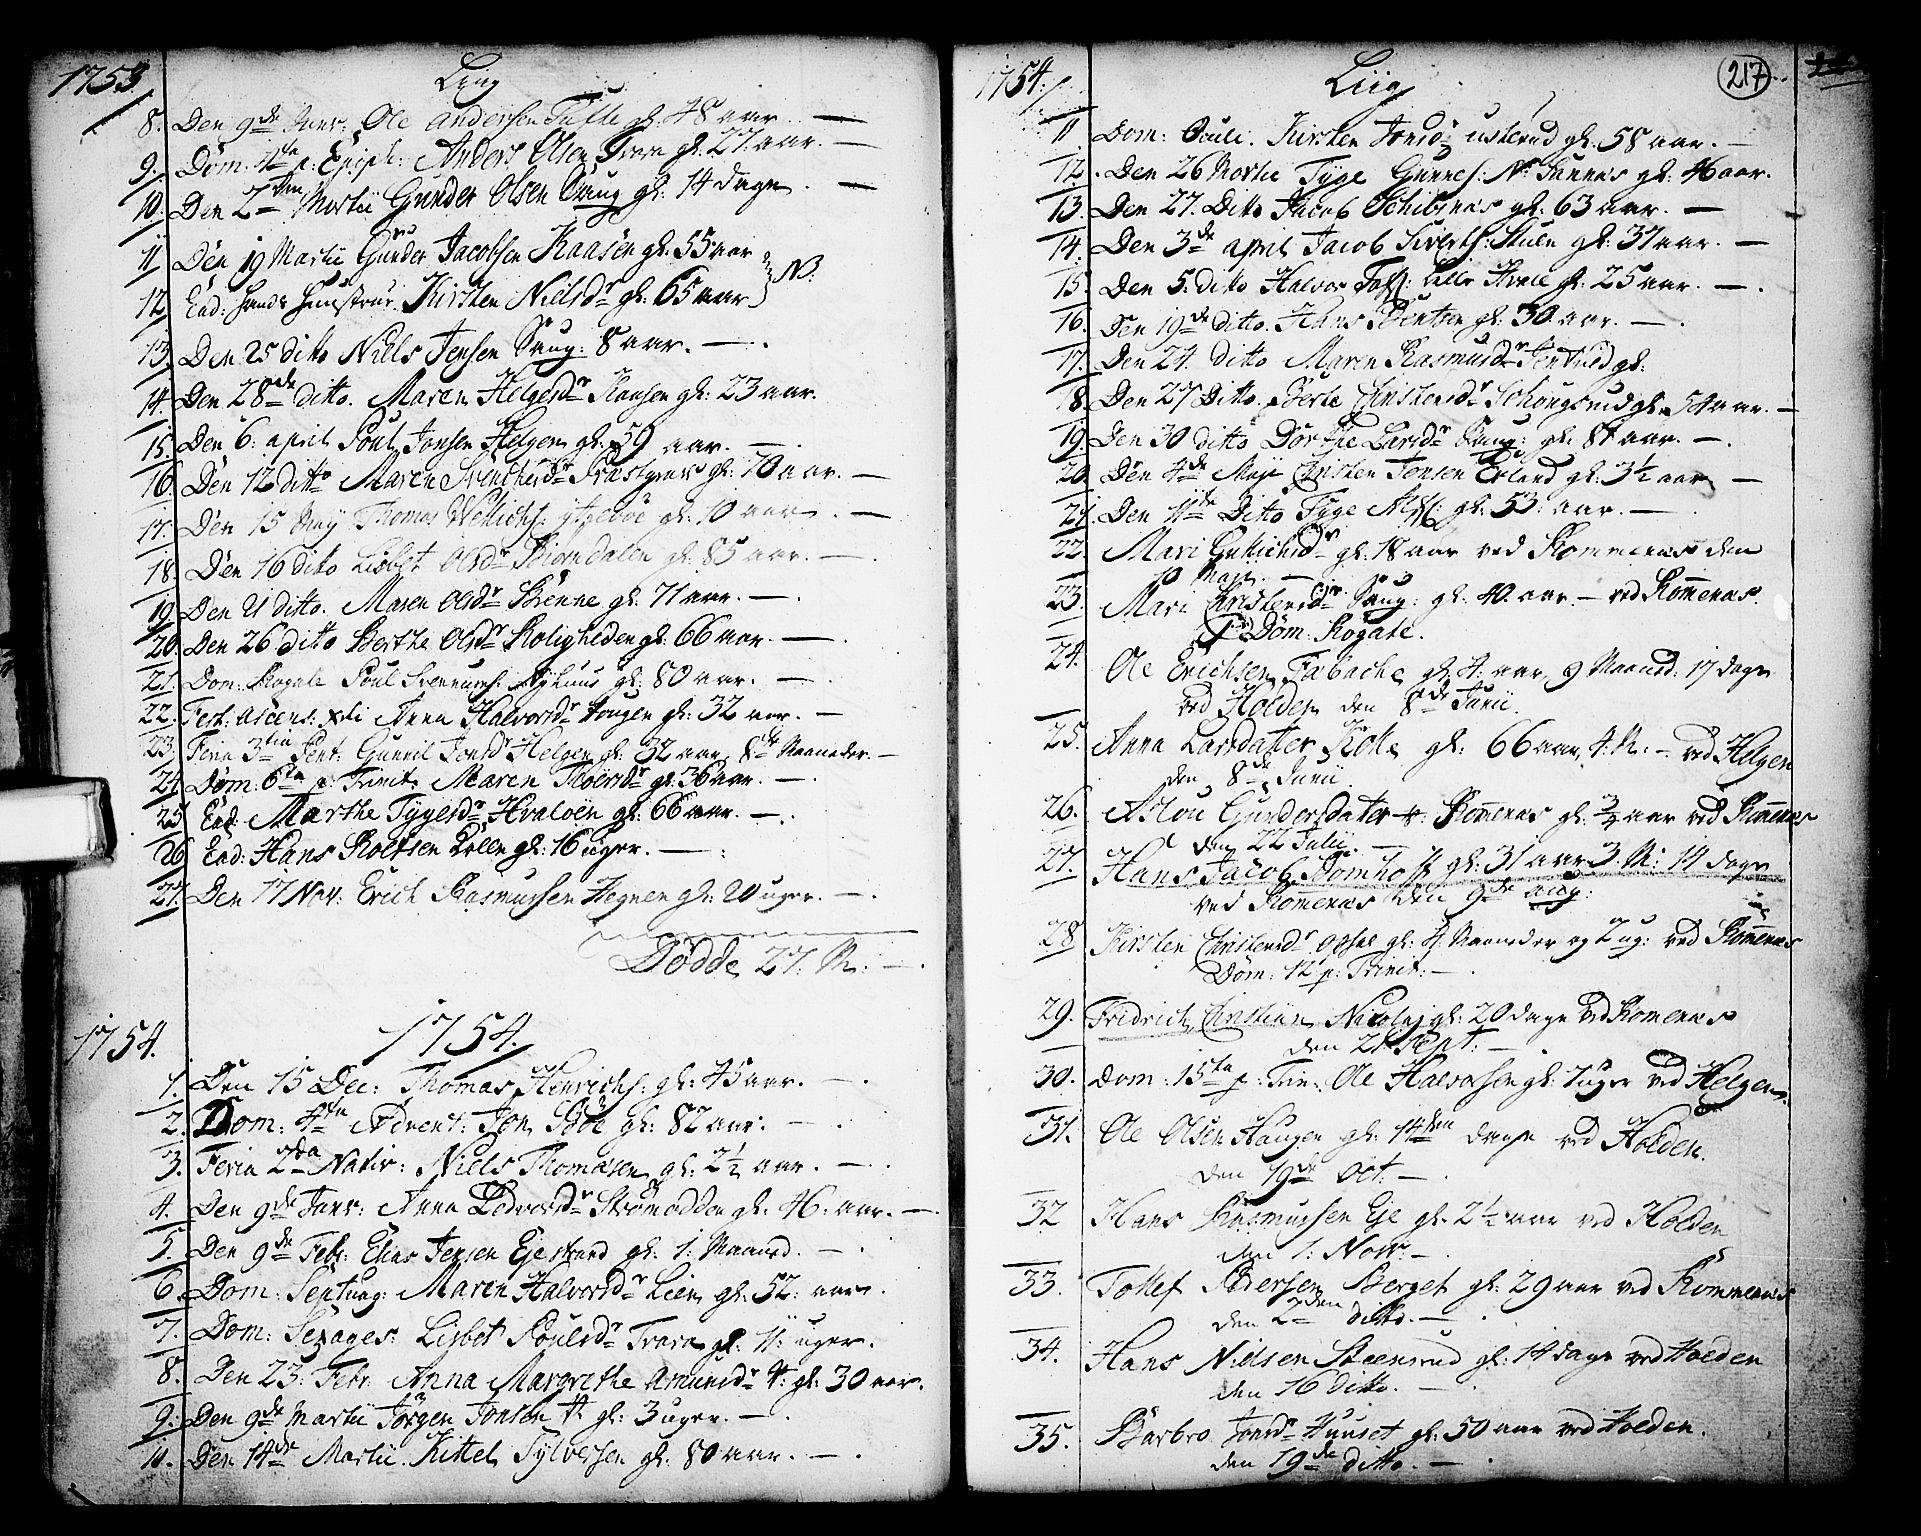 SAKO, Holla kirkebøker, F/Fa/L0001: Ministerialbok nr. 1, 1717-1779, s. 217